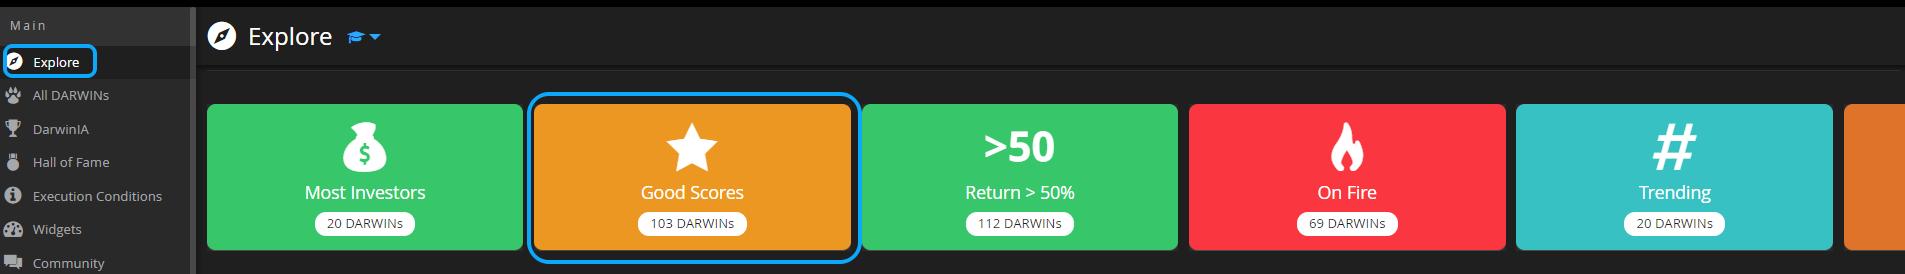 FIlter good scores